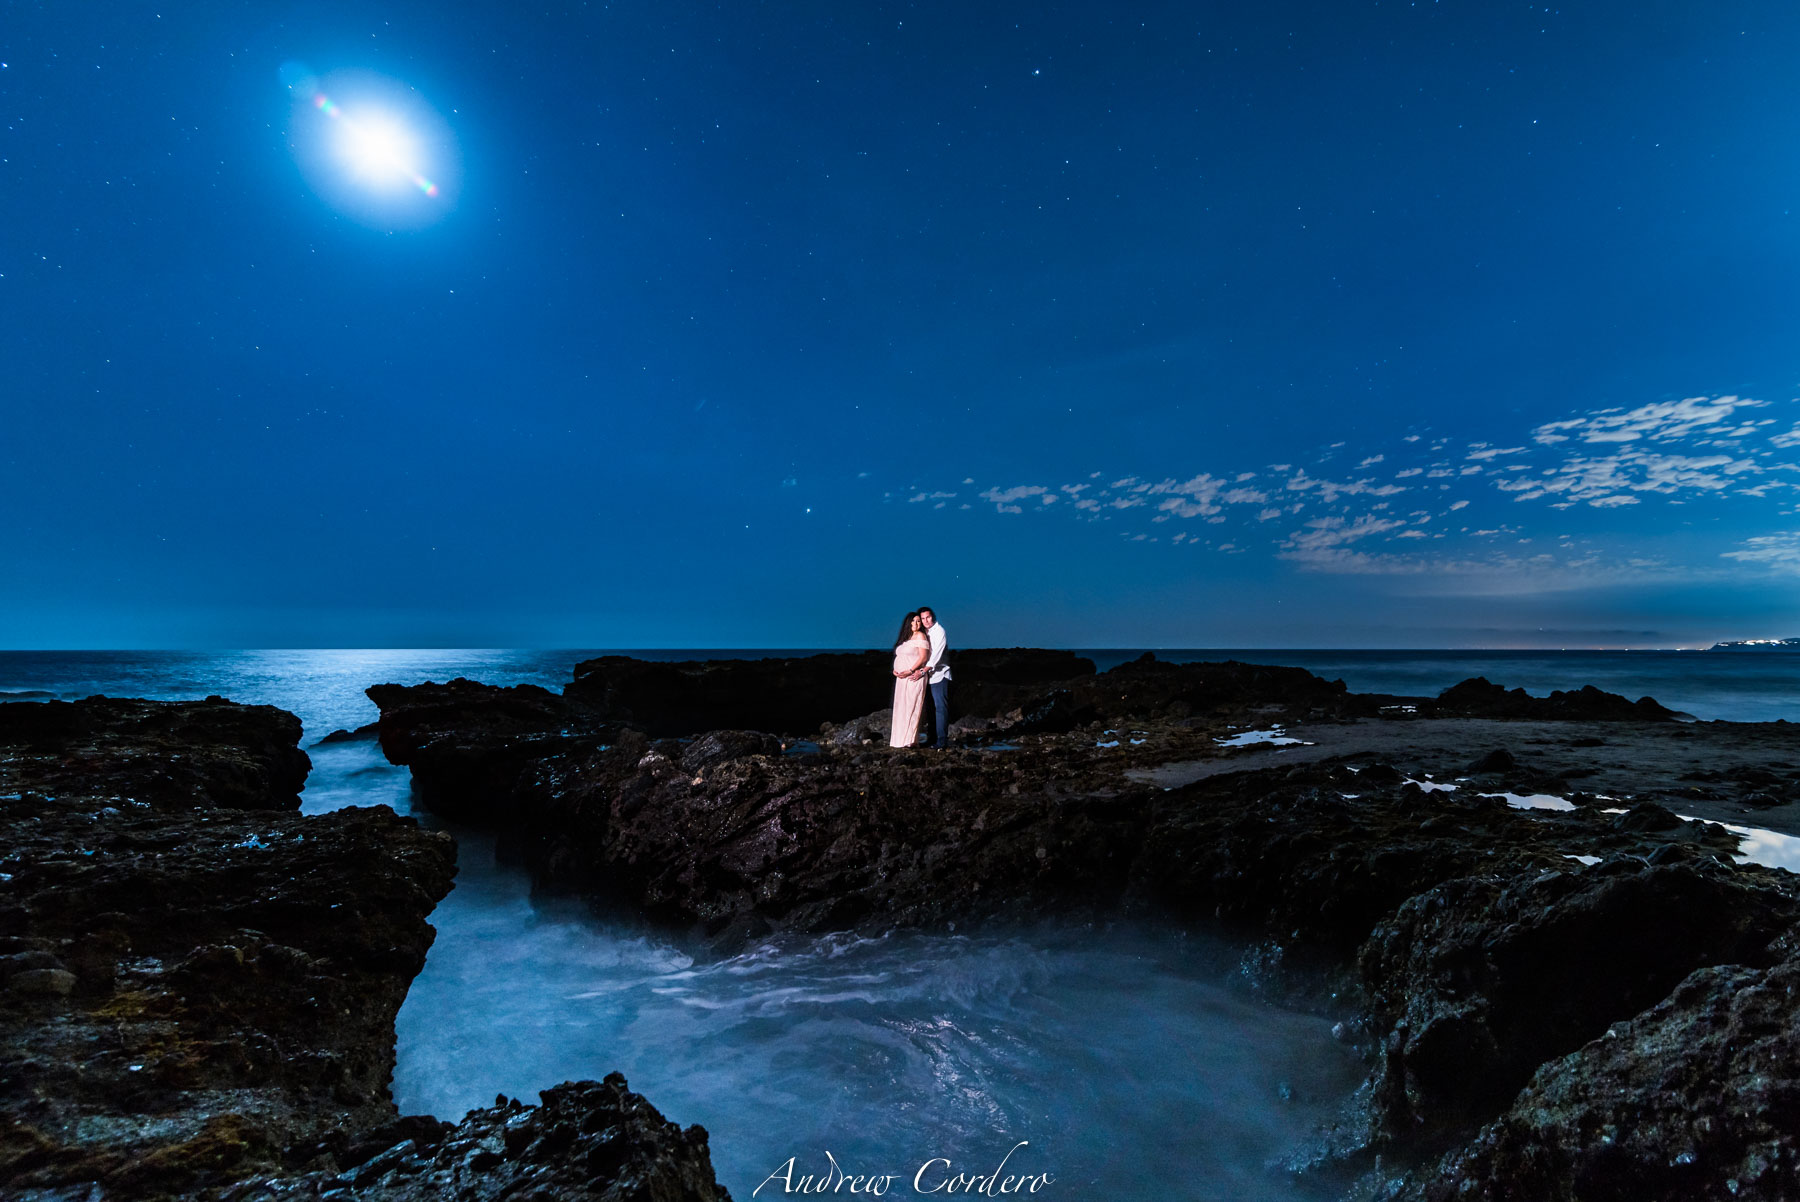 Laguna-Beach-Maternity-session-Lily-and-Erick-2.JPG